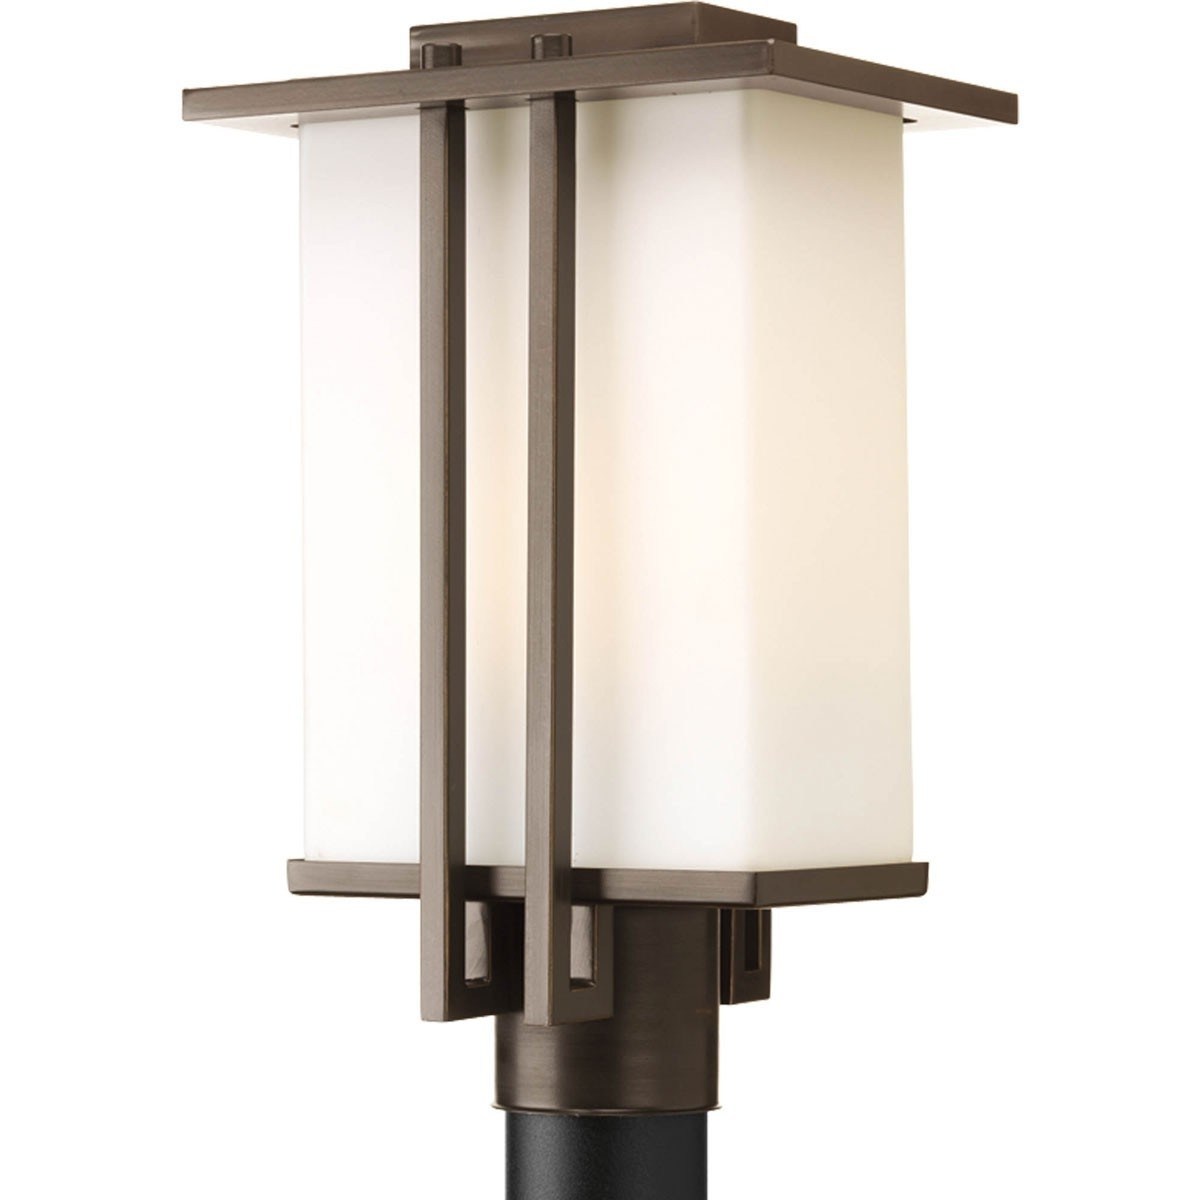 Latest Modern Outdoor Light Posts Post Lights Lighting Ideas Interior Regarding Outdoor Post Lanterns (View 2 of 20)